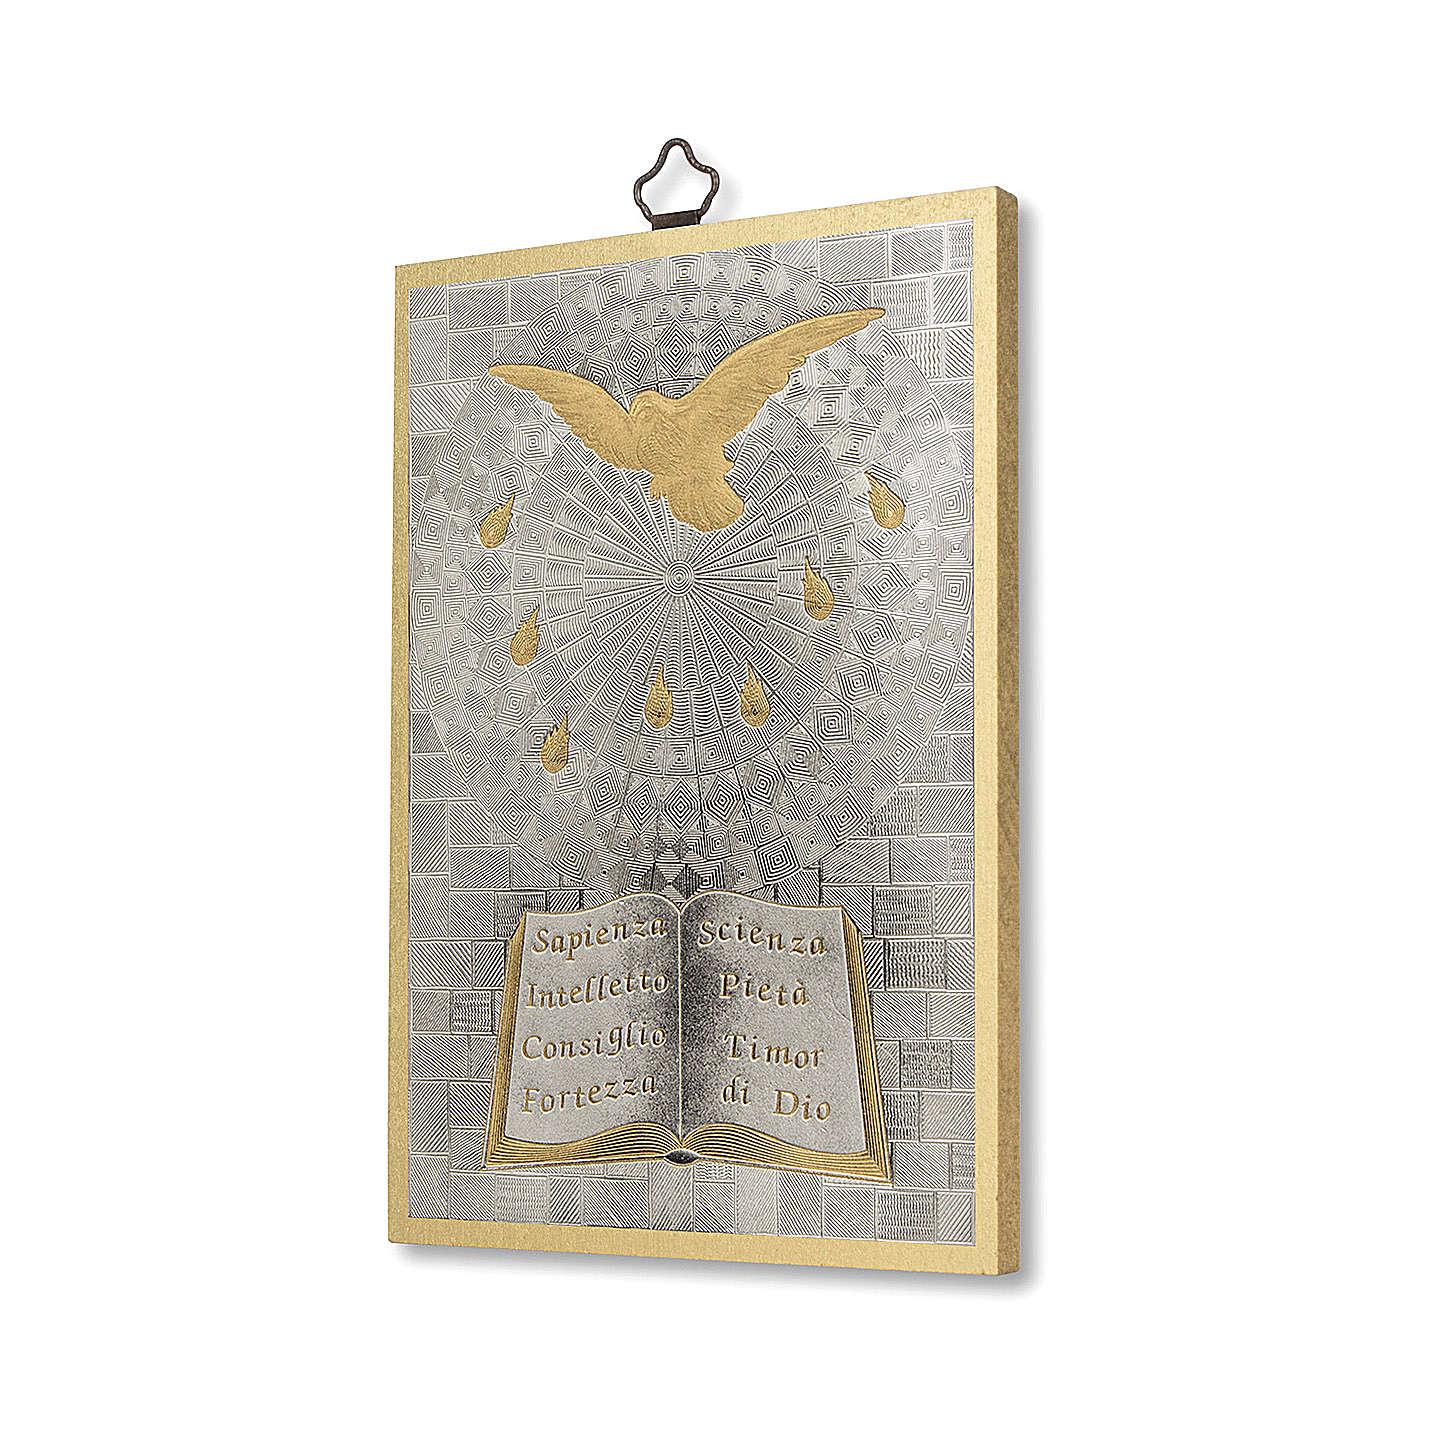 Impreso sobre madera Espíritu Santo 3